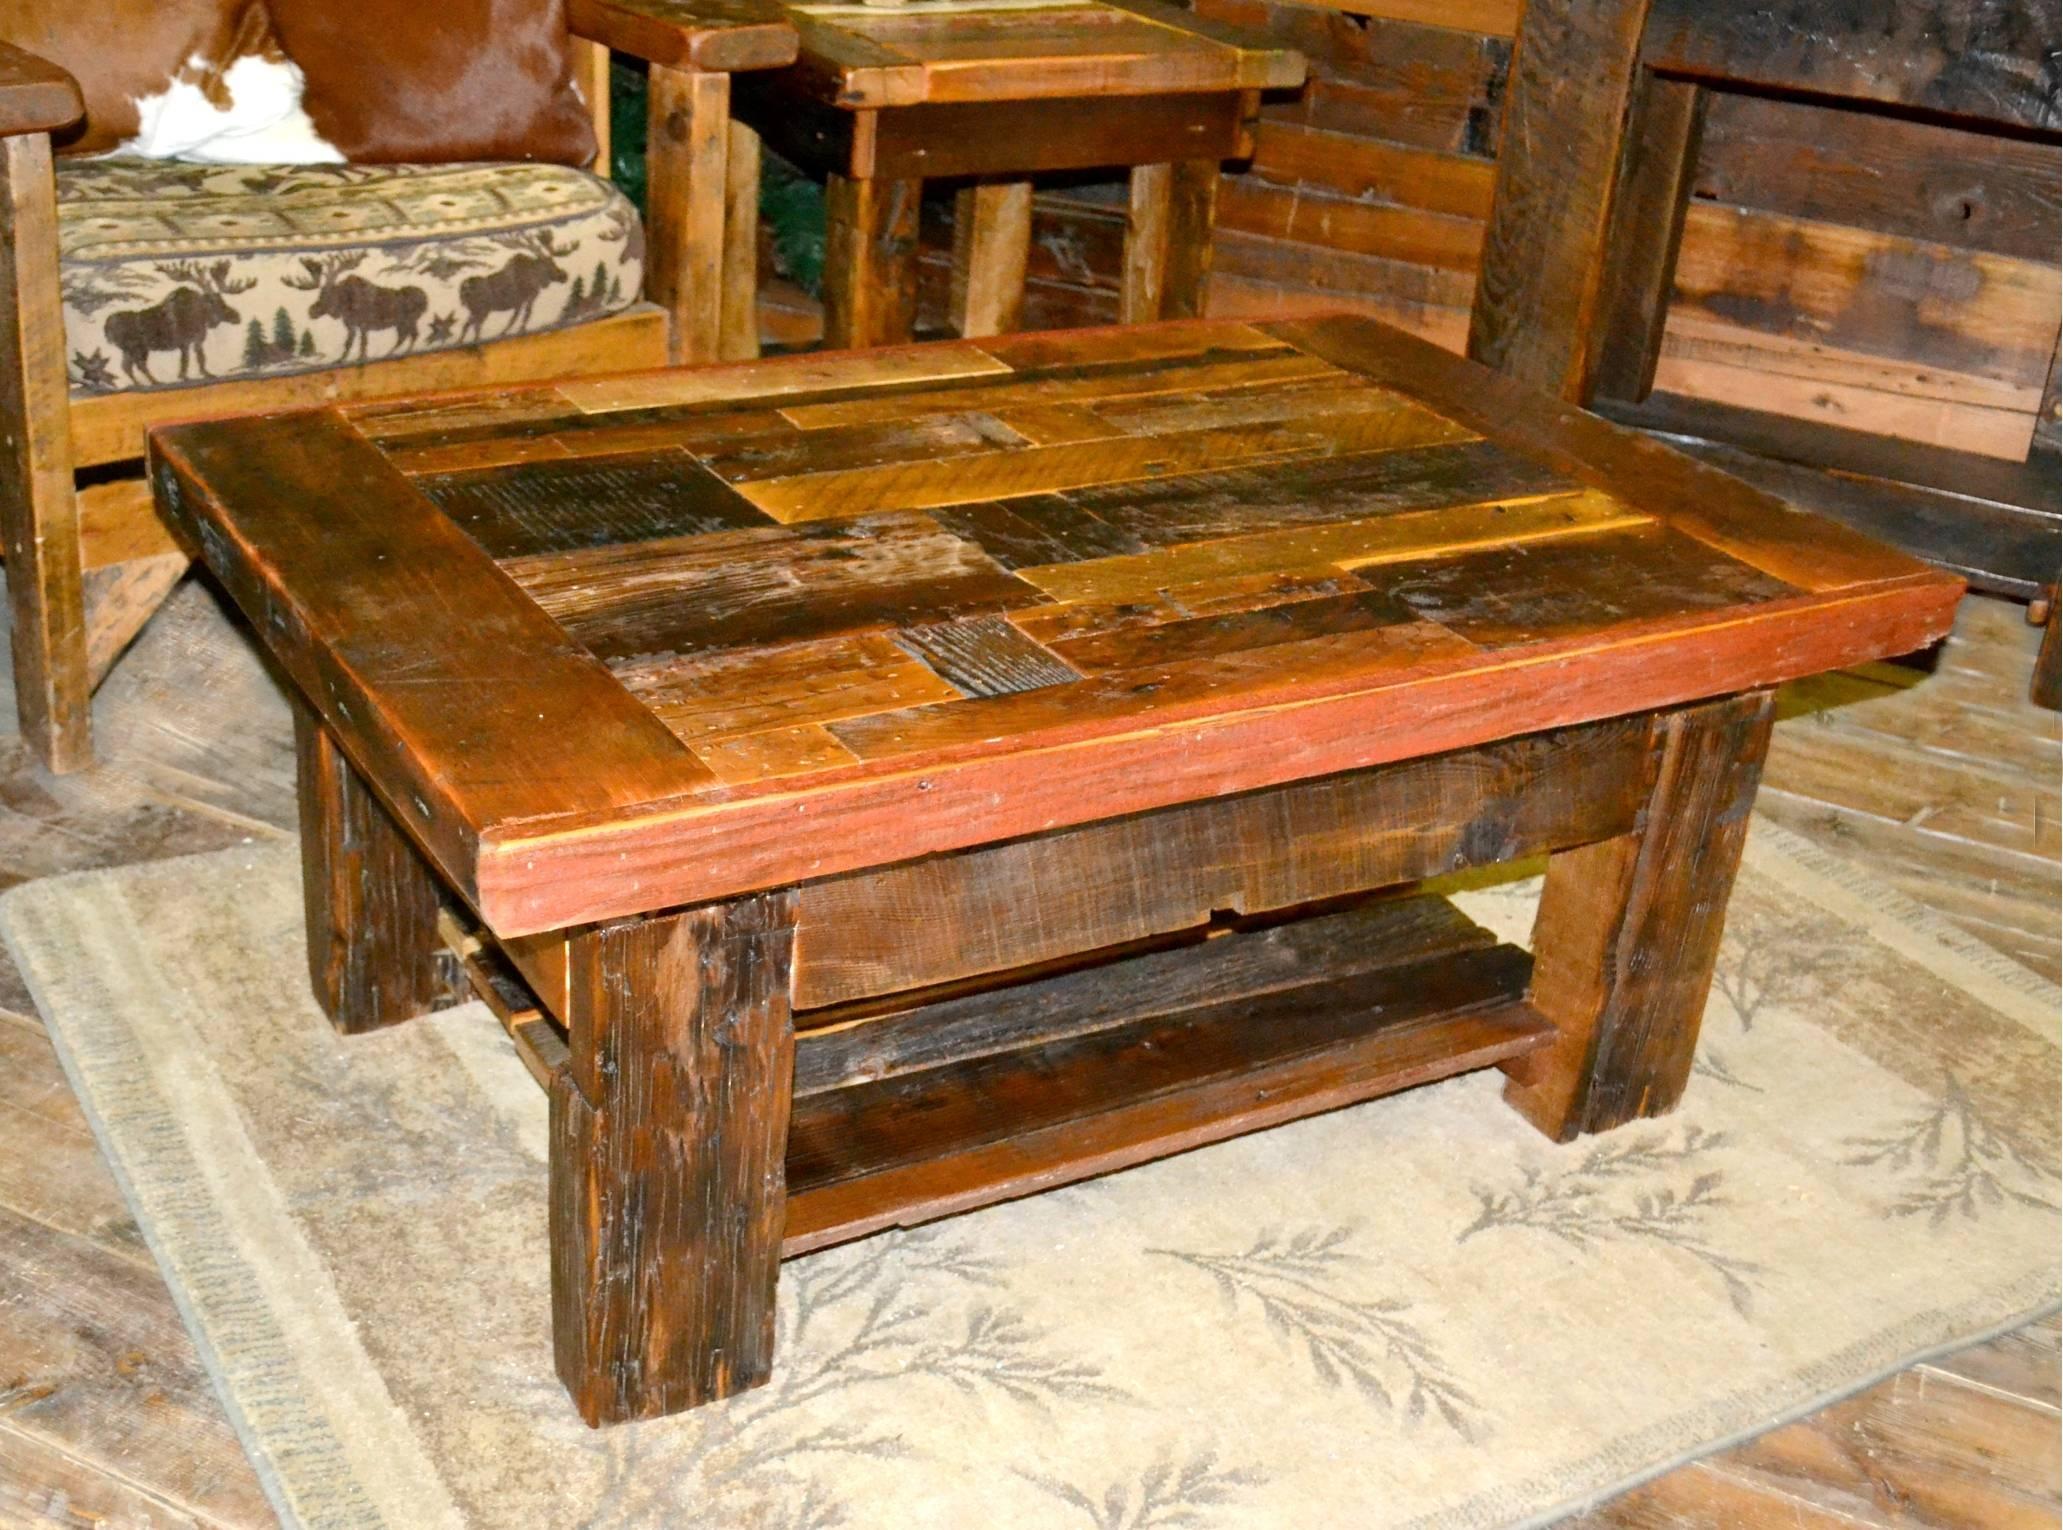 Collage Barnwood Coffee Table | Rustic Furniture Malltimber Creek with regard to Rustic Barnwood Coffee Tables (Image 9 of 30)